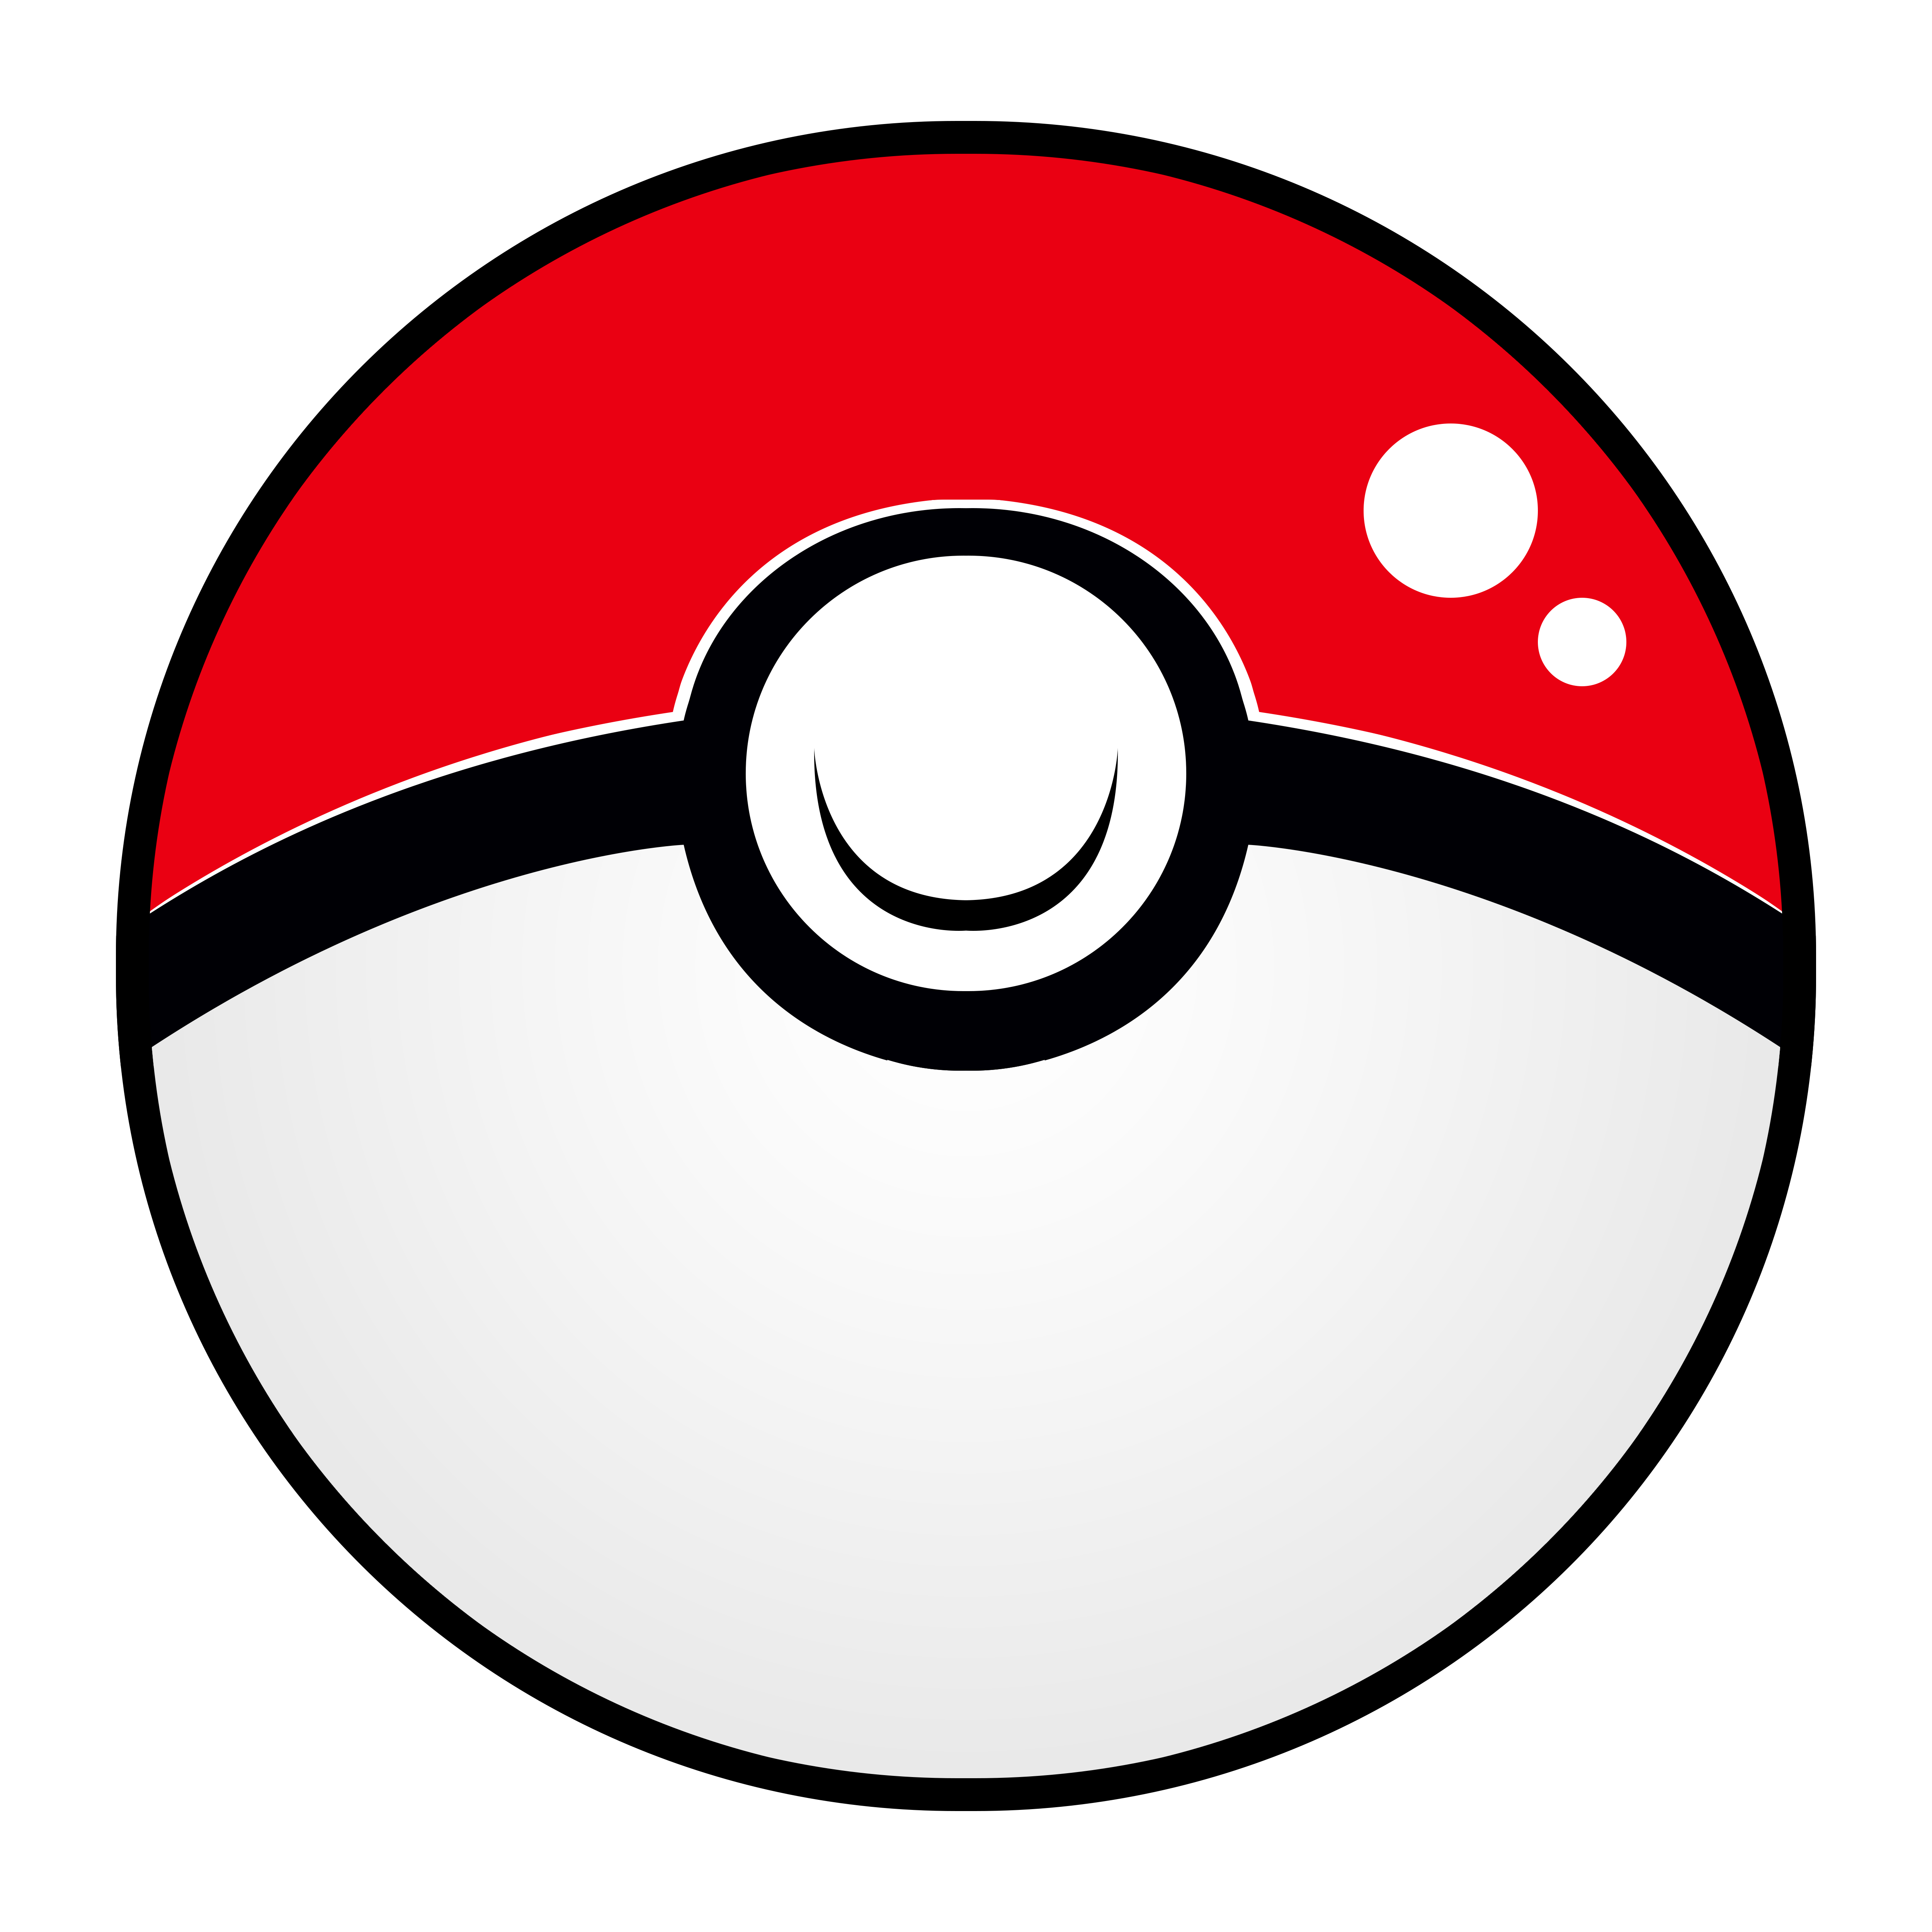 5000x5000 Pokeball, Pokemon Ball Png Images Free Download